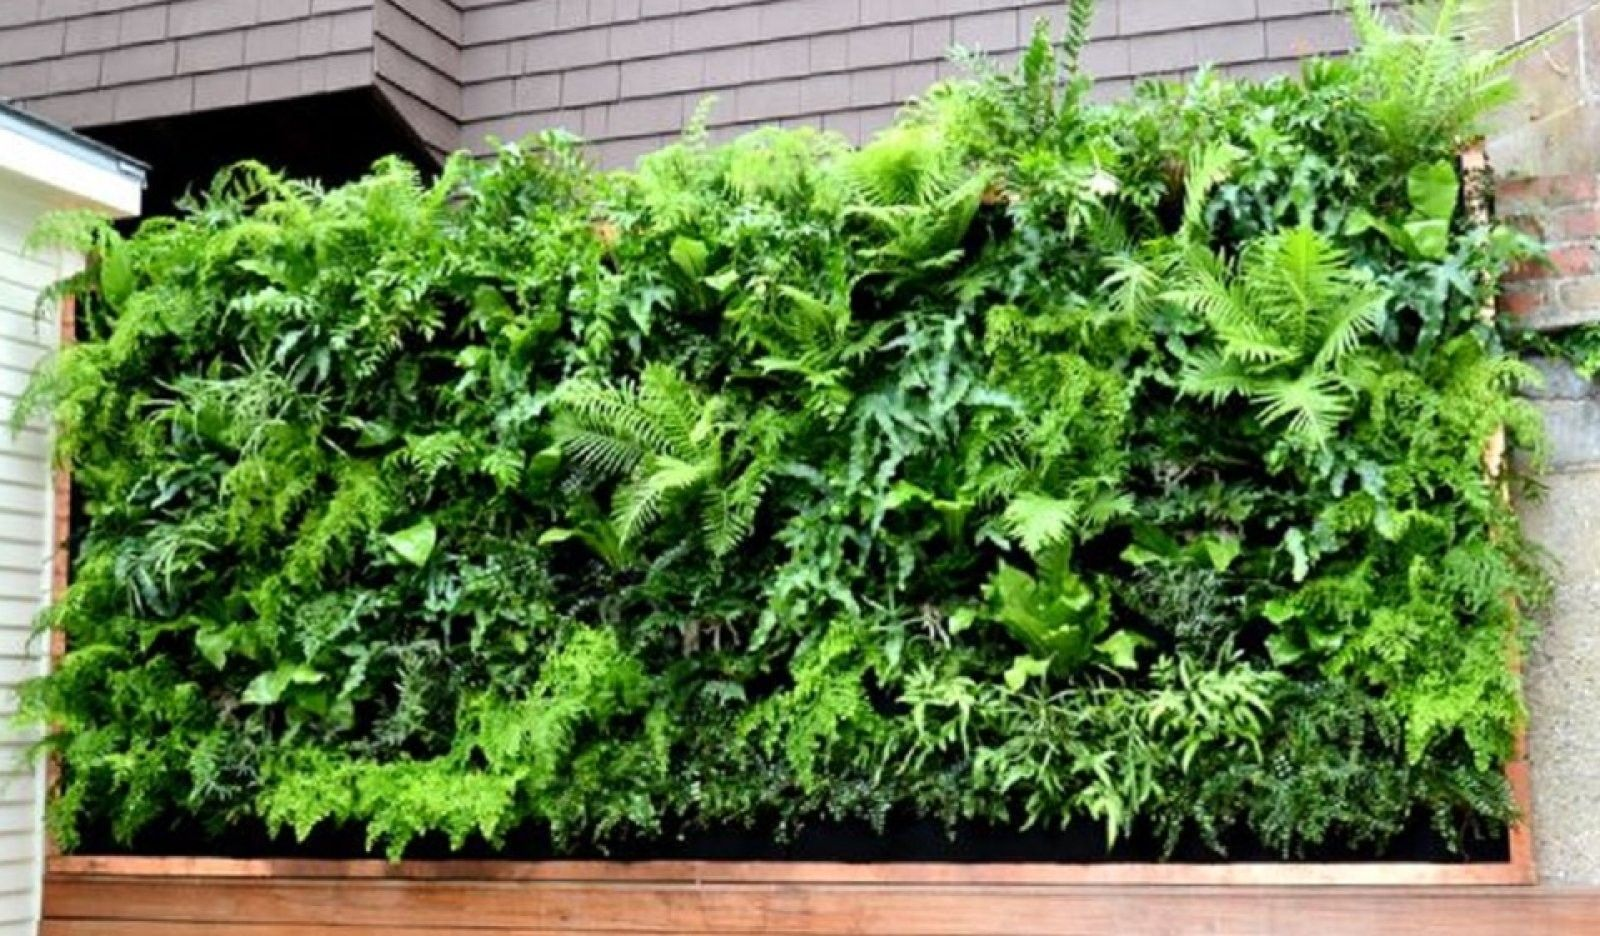 Ideas que mejoran tu vida | Terrarios - plantas - huerta | Pinterest ...